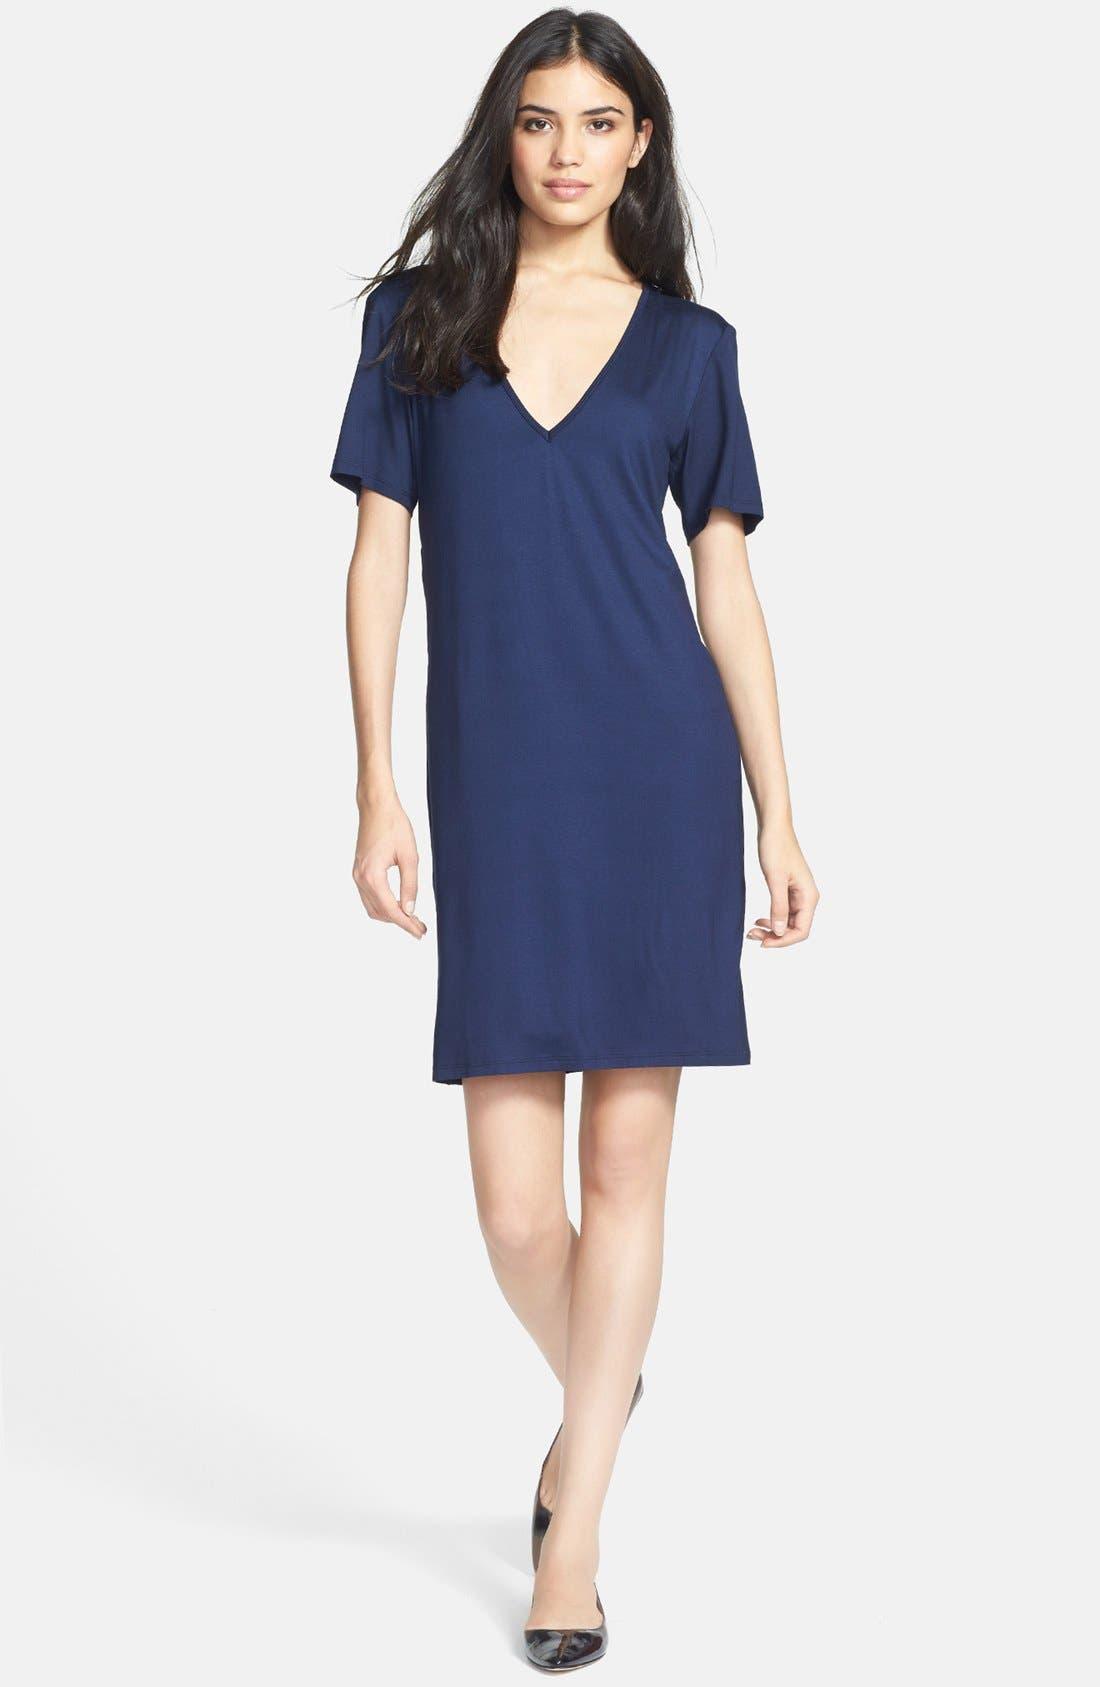 Main Image - Trina Turk 'Lanna' Jersey T-Shirt Dress